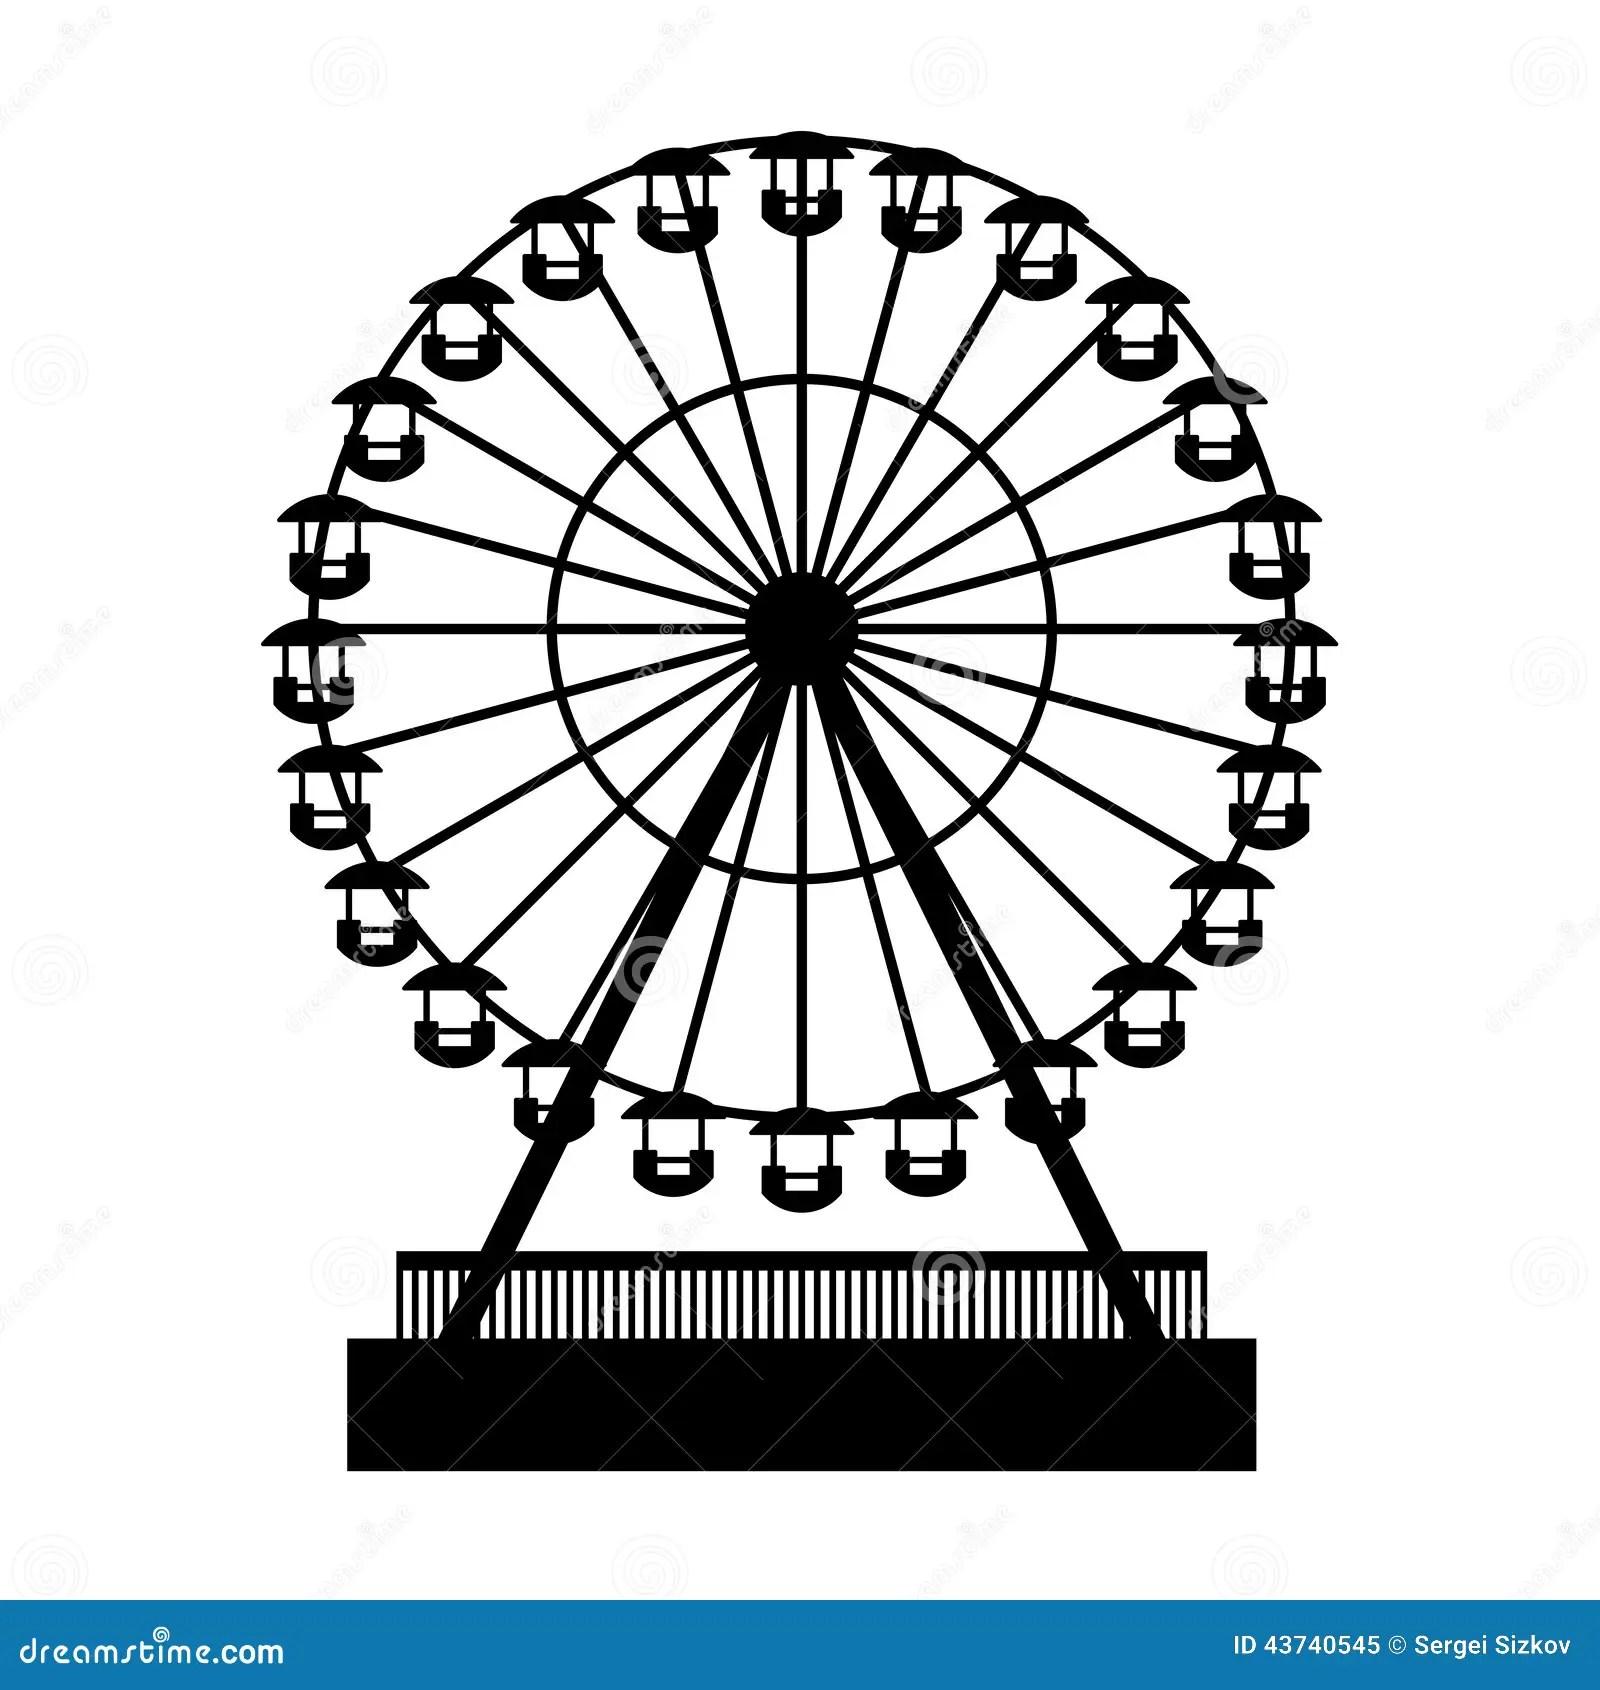 Silhouette Park Atraktsion Ferris Wheel Vector Stock